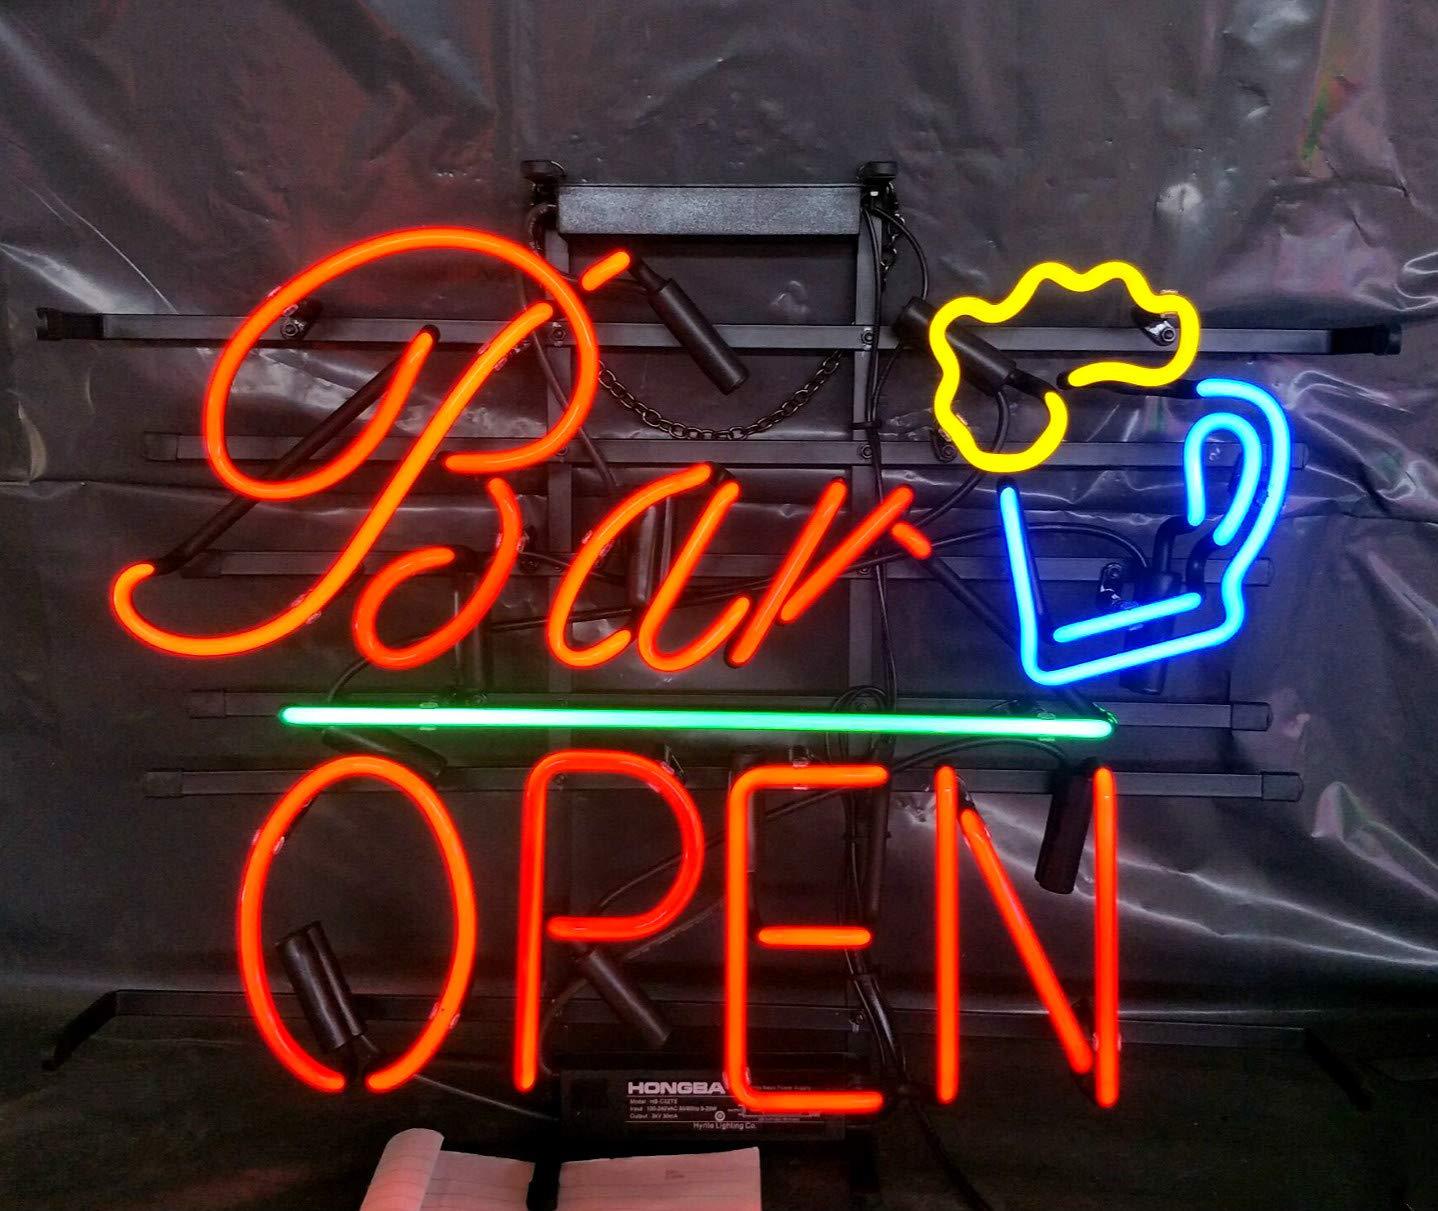 Gorgeous neon ネオンサイン― お酒お店 ネオン看板装飾用ガラスネオンサイン。バー、クラブ、レストラン、カフェー、スナック、車庫などいろいろなシーンで壁面装飾としてお使い頂けます。 (2) (4) (7) (1) (6) (6) (1) (6) (2) (4) (2) (2) (2) (1) (1) (1) (1) B07F5TQJG5